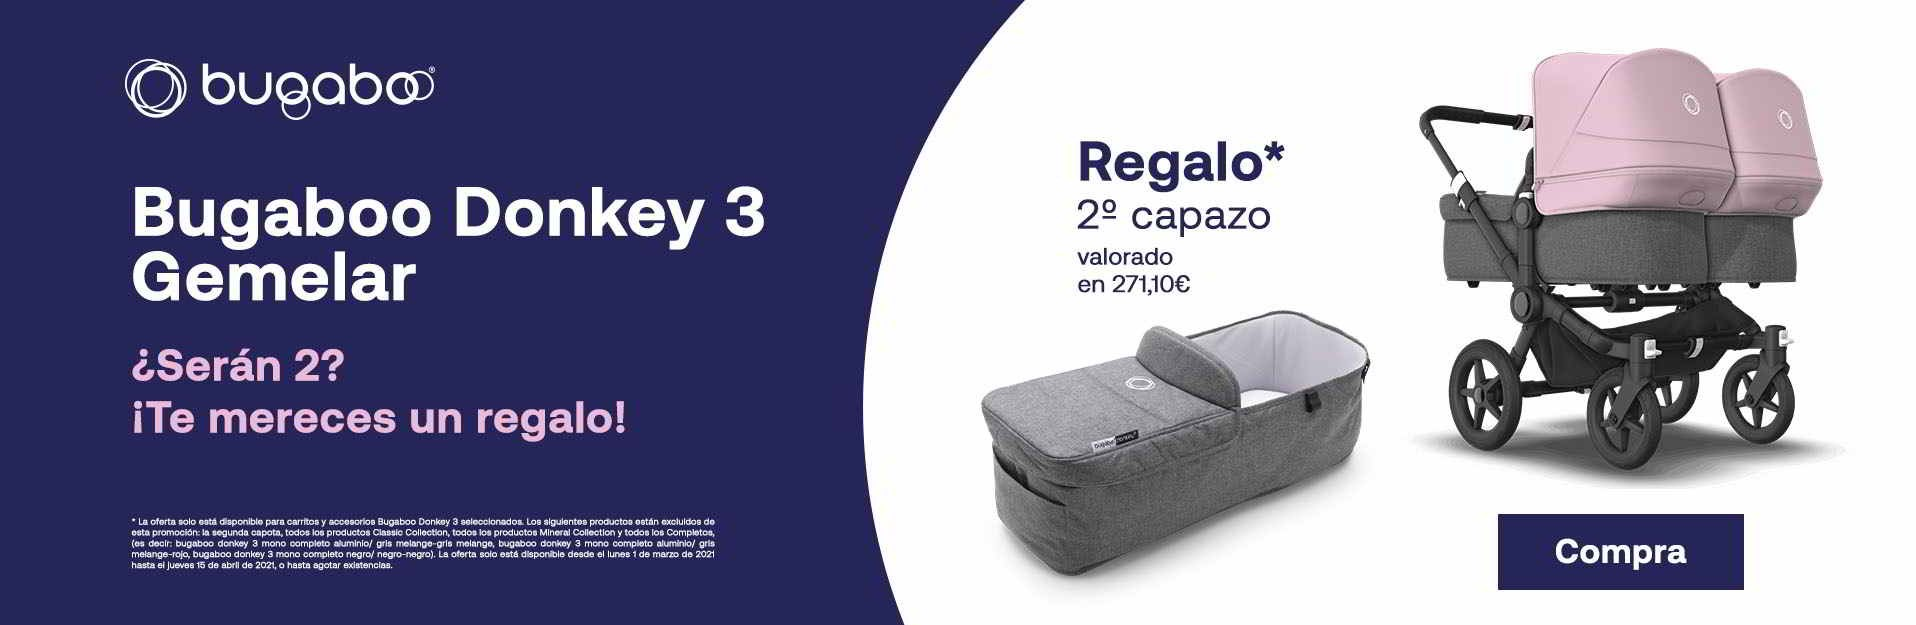 TE MERECES UN REGALO BUGABOO DONKEY 3 GEMELAR